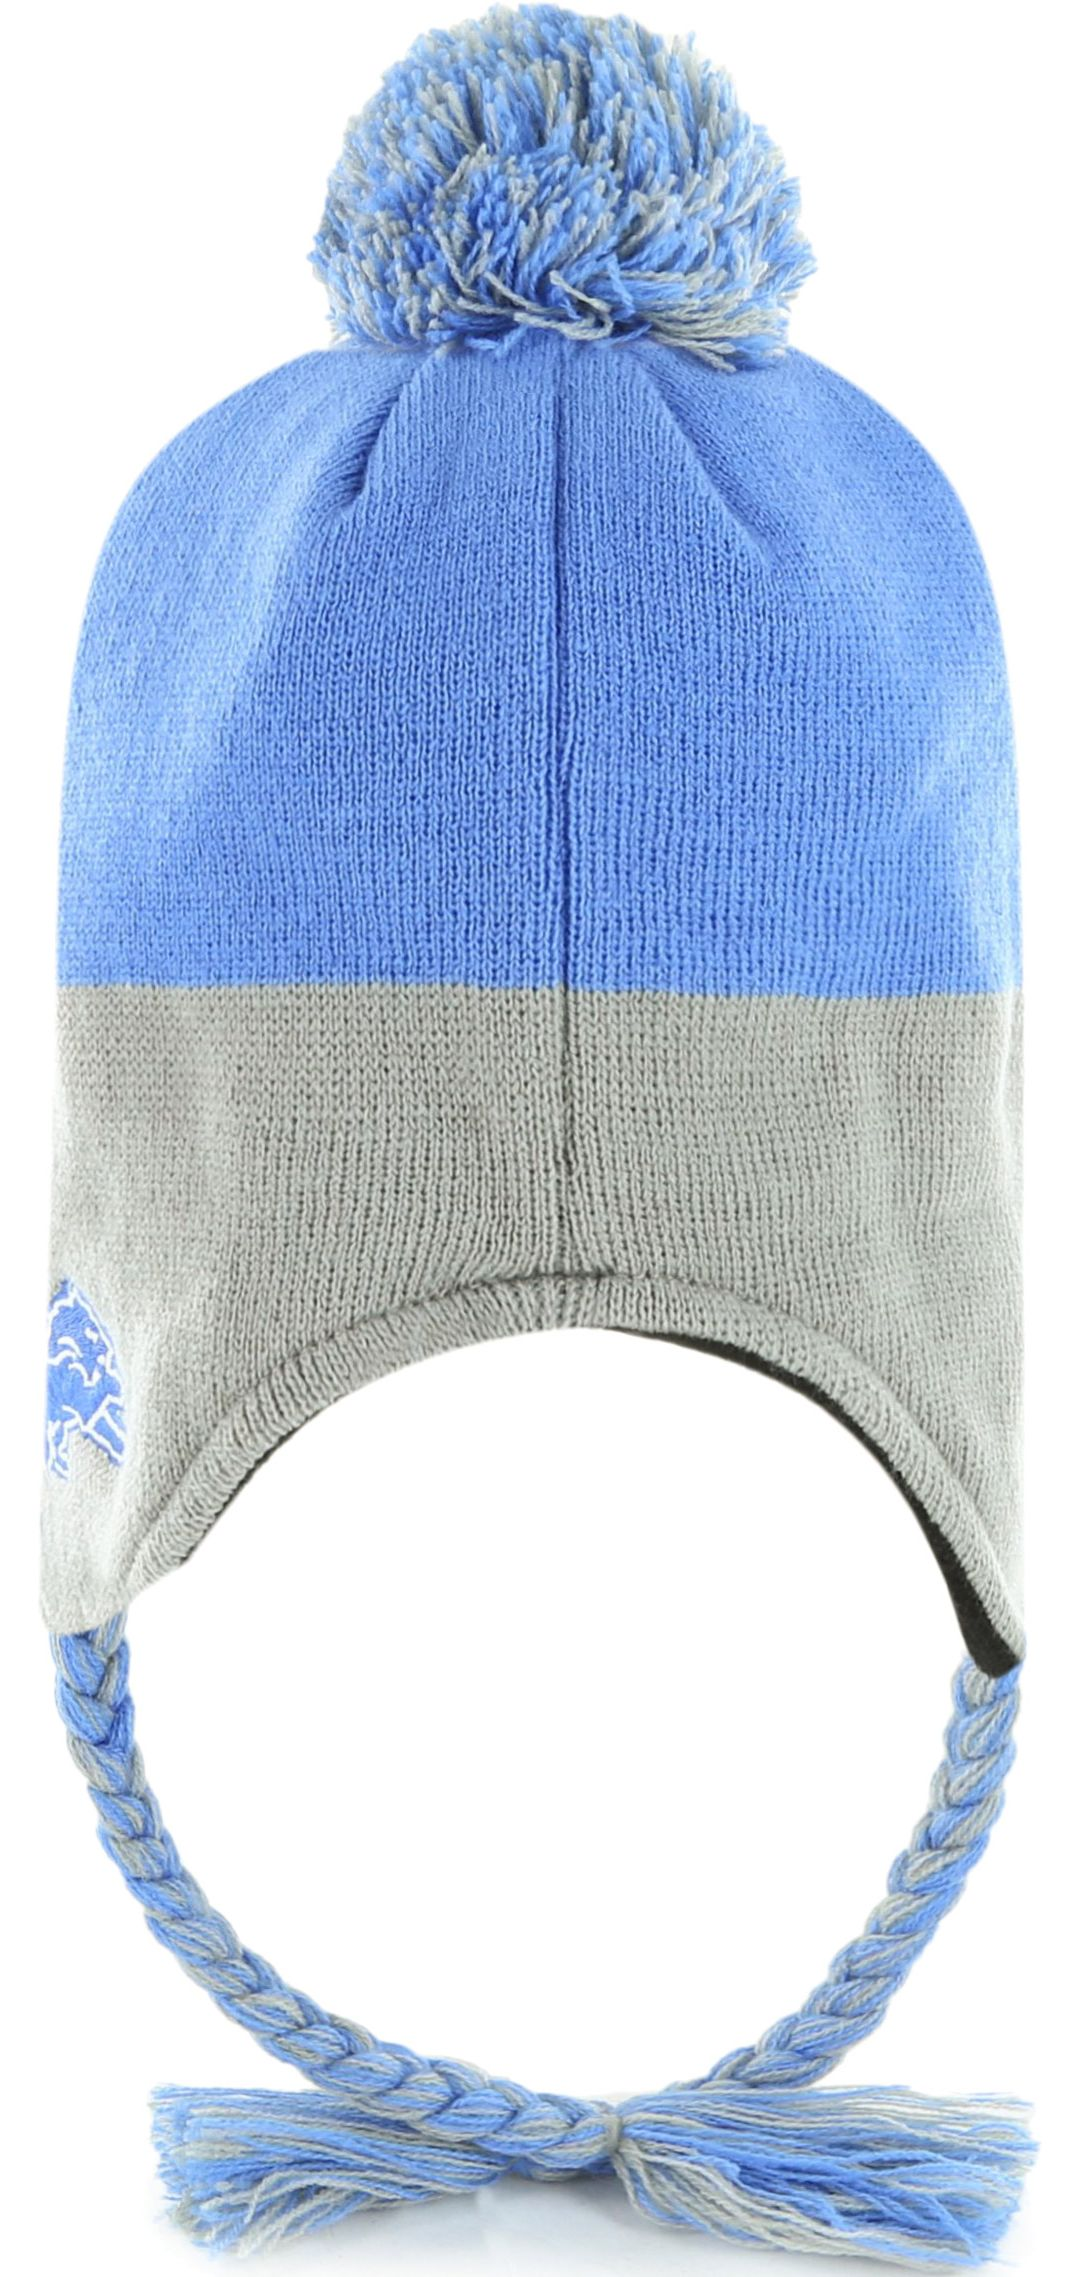 98f7bd48 '47 Youth Detroit Lions Hammerhead Blue Knit Trapper